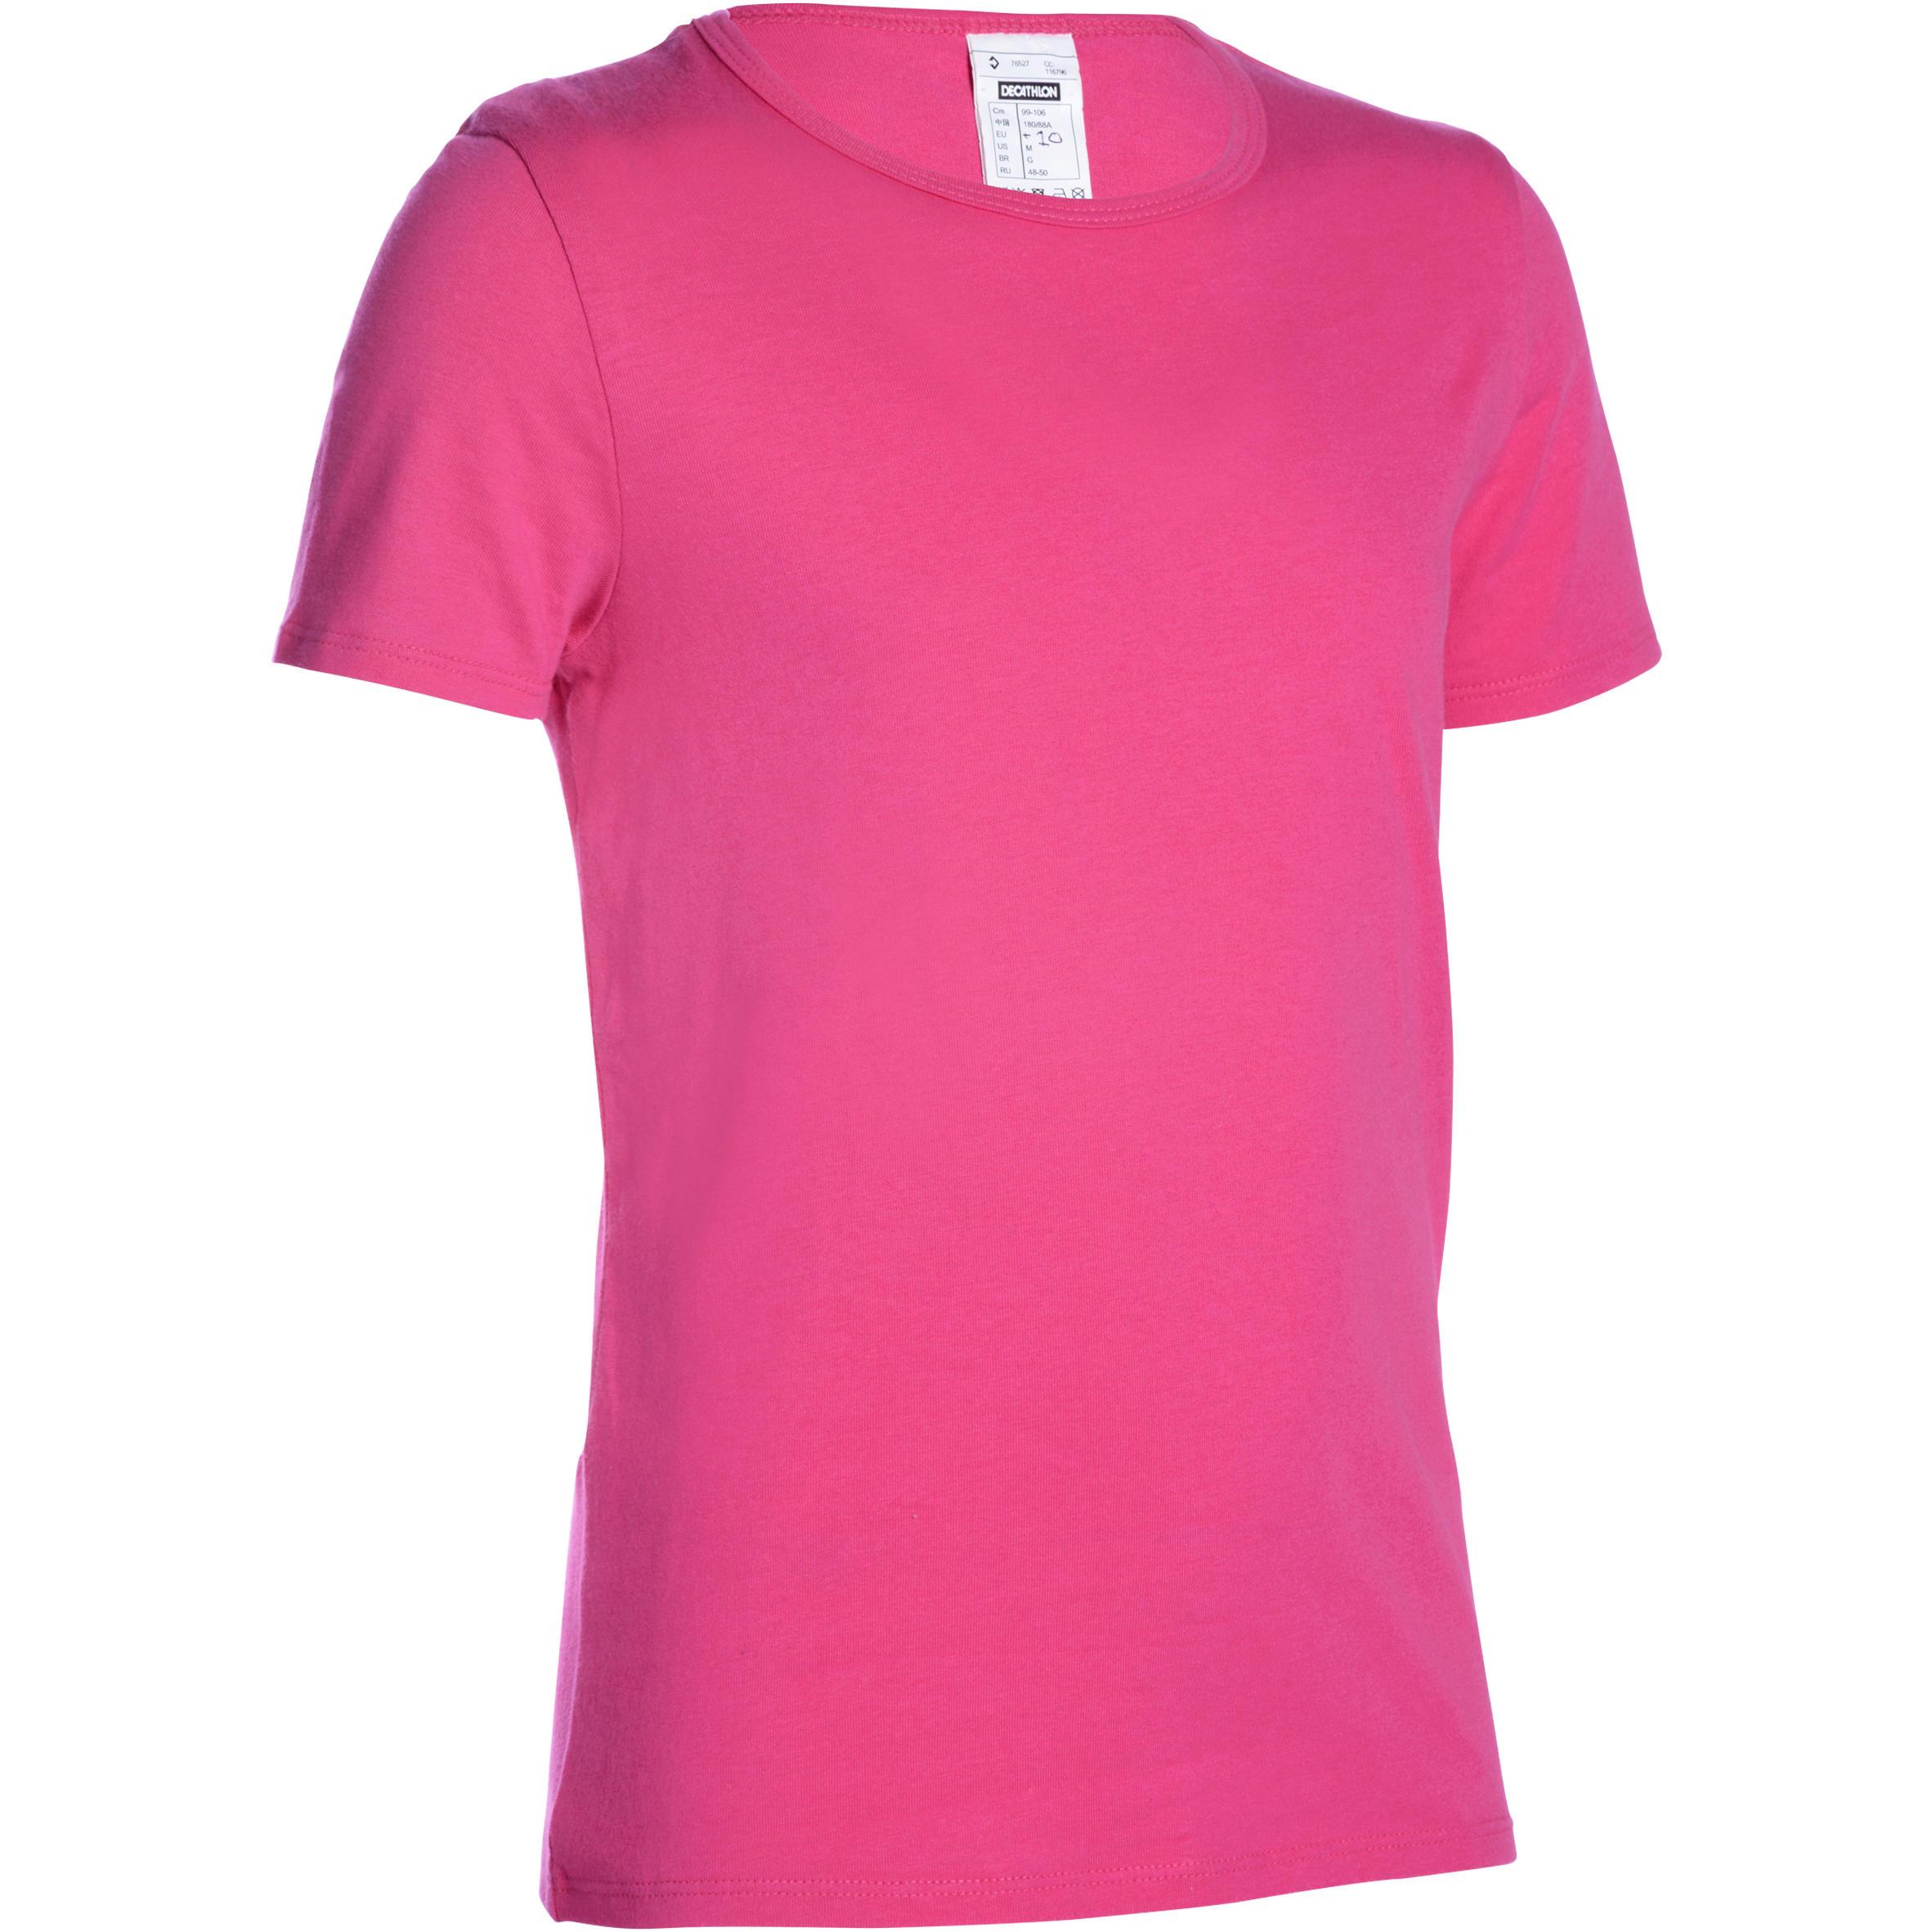 Camiseta de manga corta gimnasia niña rosa